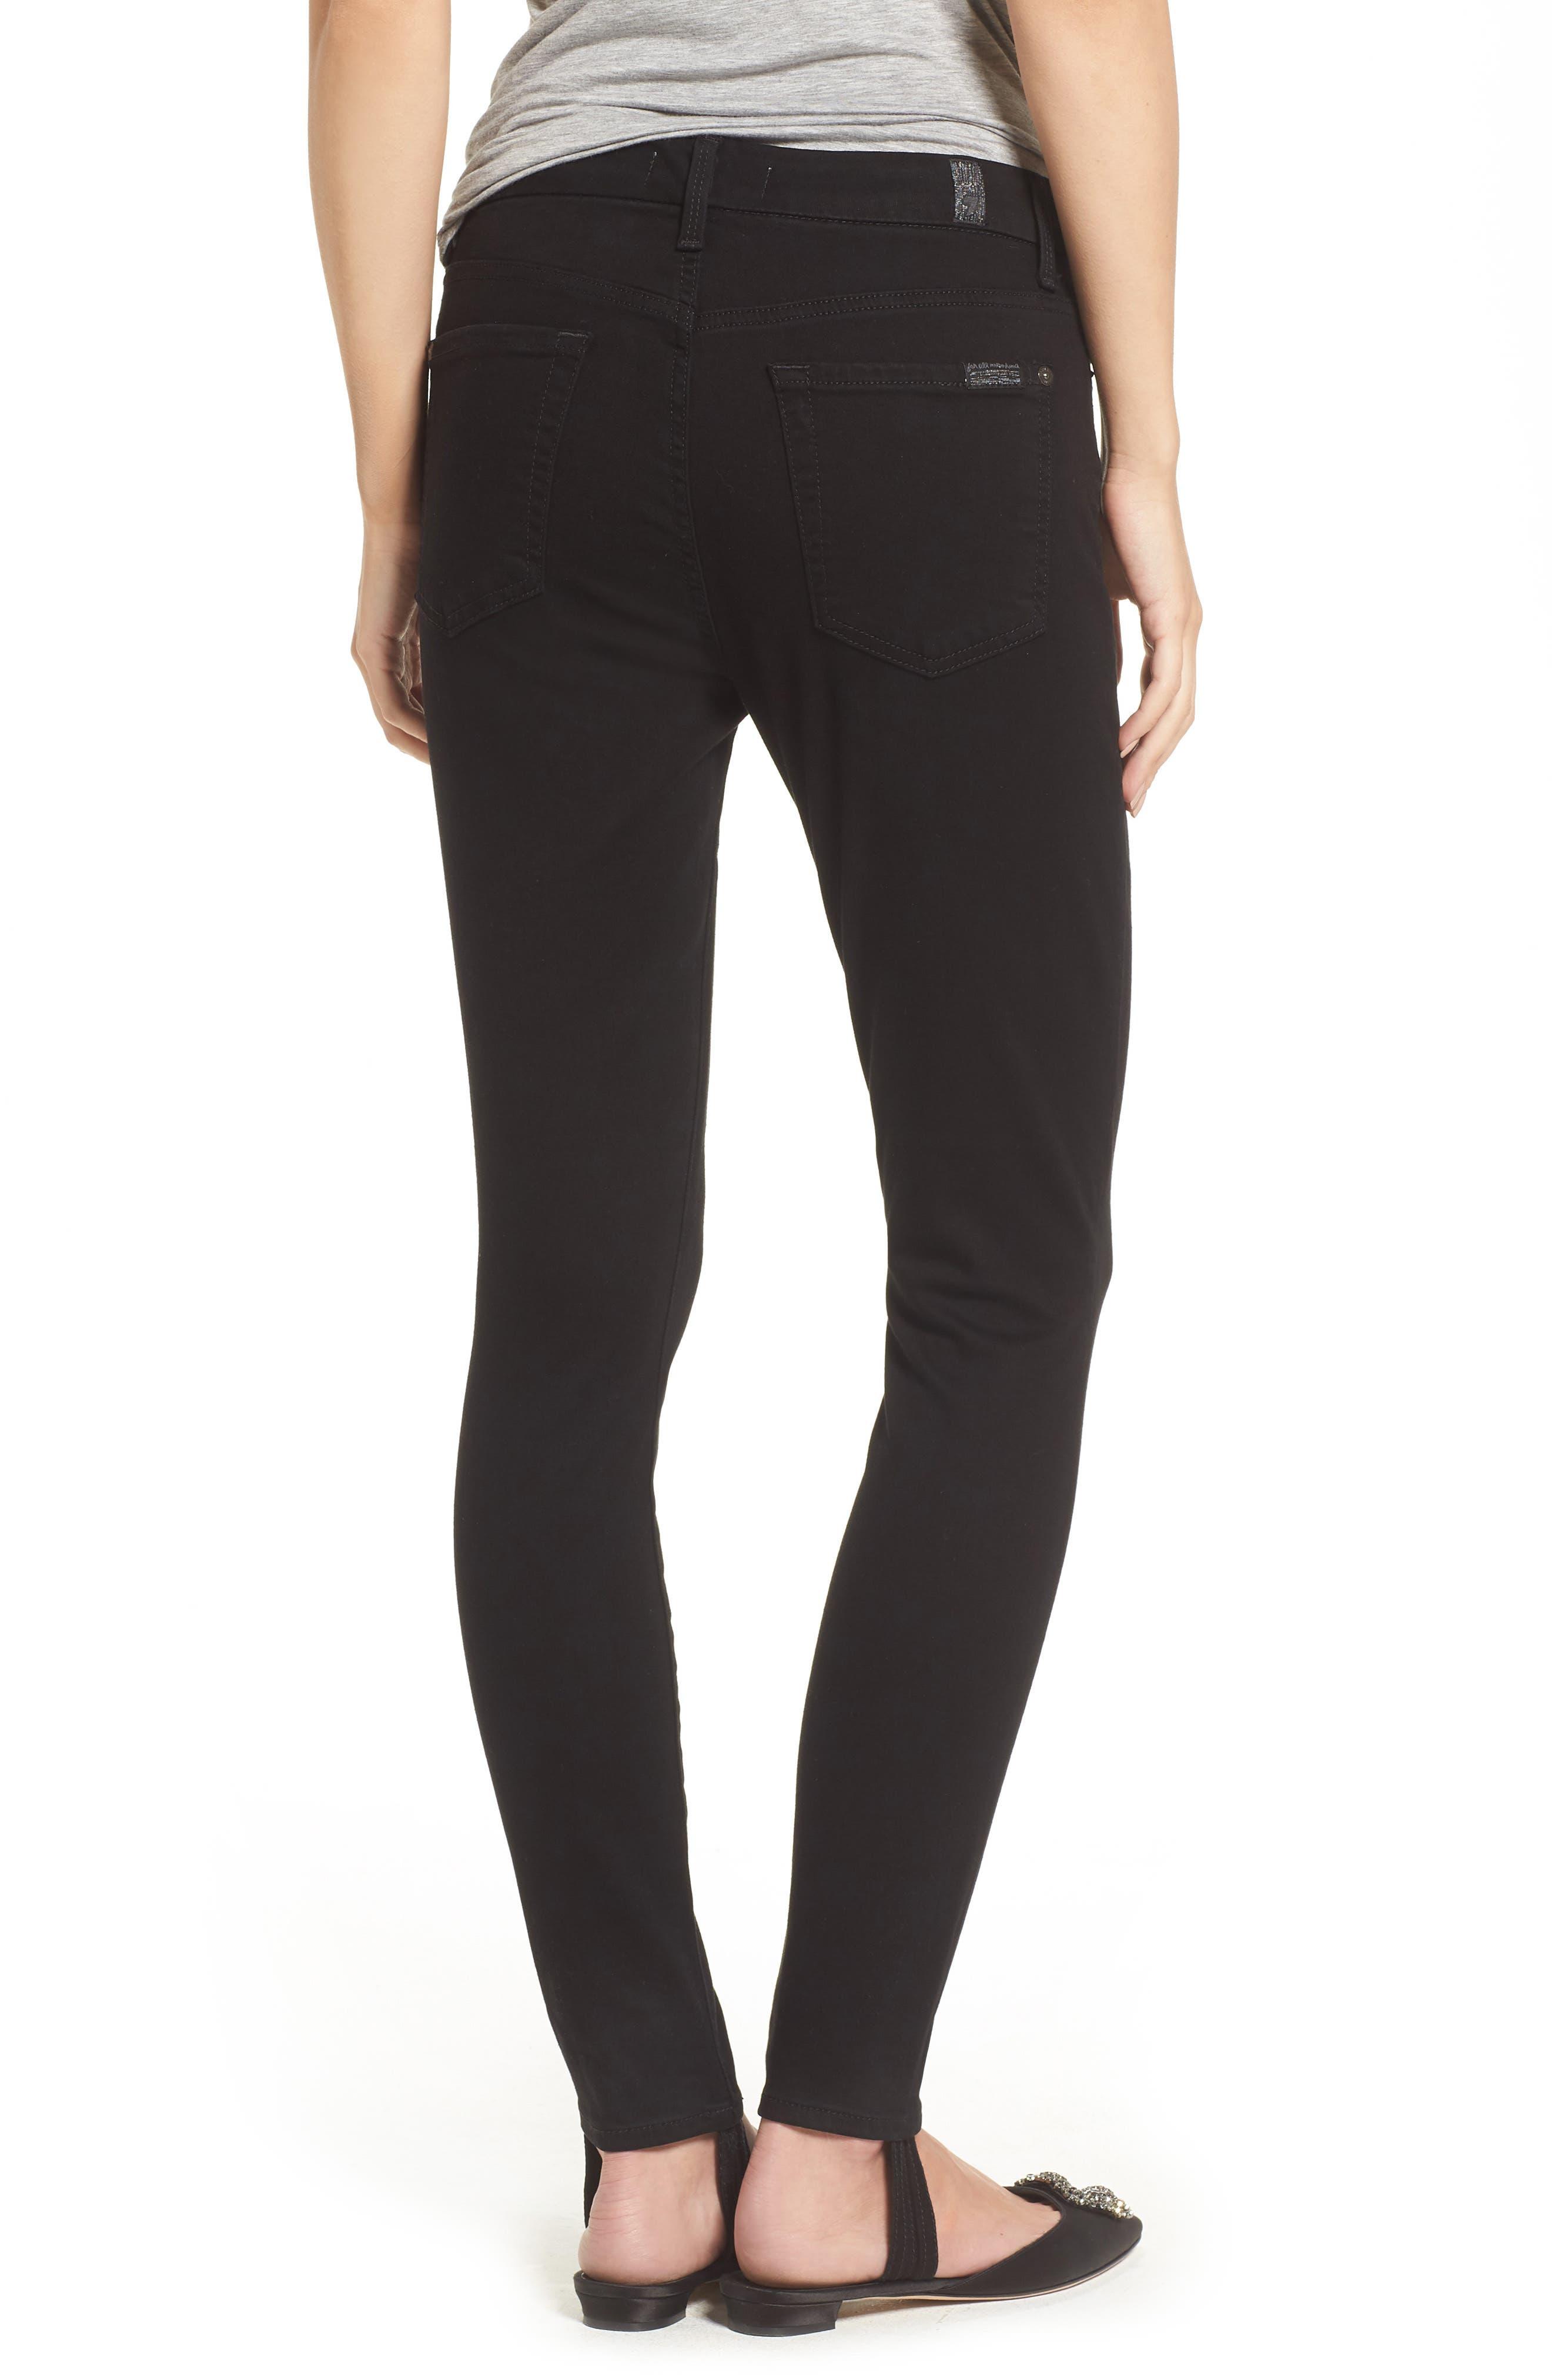 b(air) High Waist Ankle Skinny Stirrup Jeans,                             Alternate thumbnail 2, color,                             004